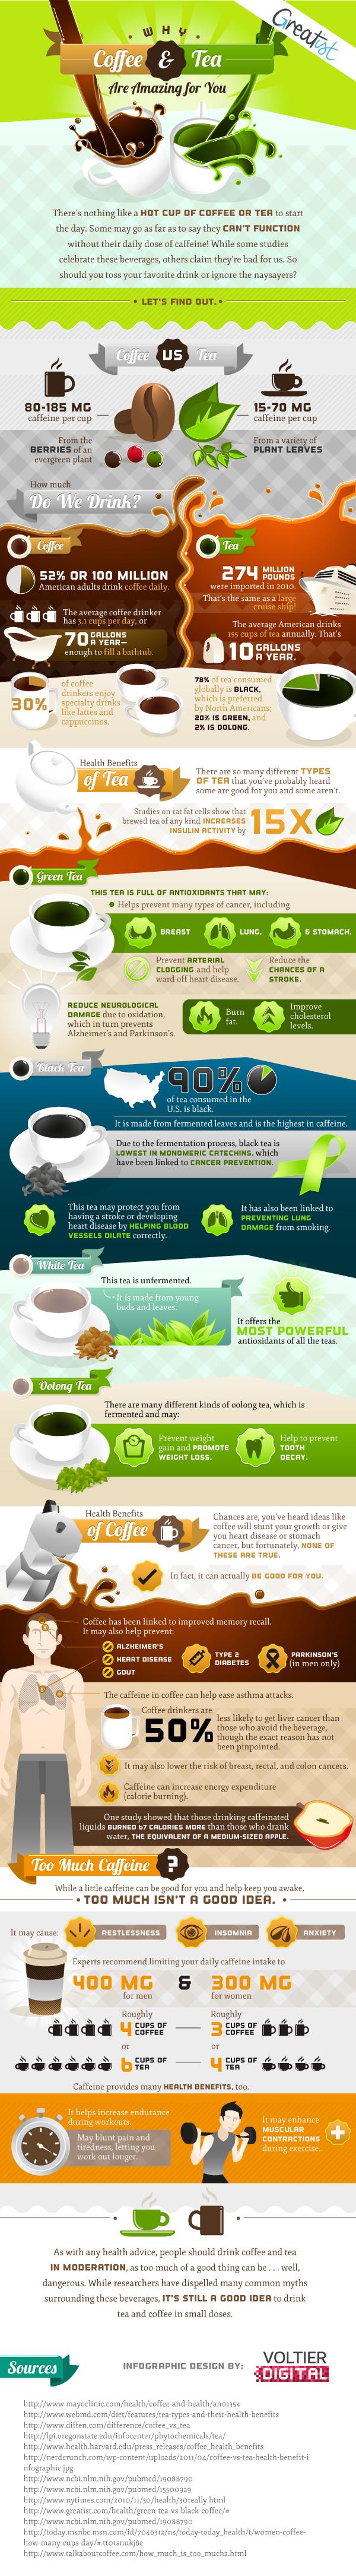 Beneficios del café y el té - #infografia / Why coffee and tea are amazing for you? - #infographic